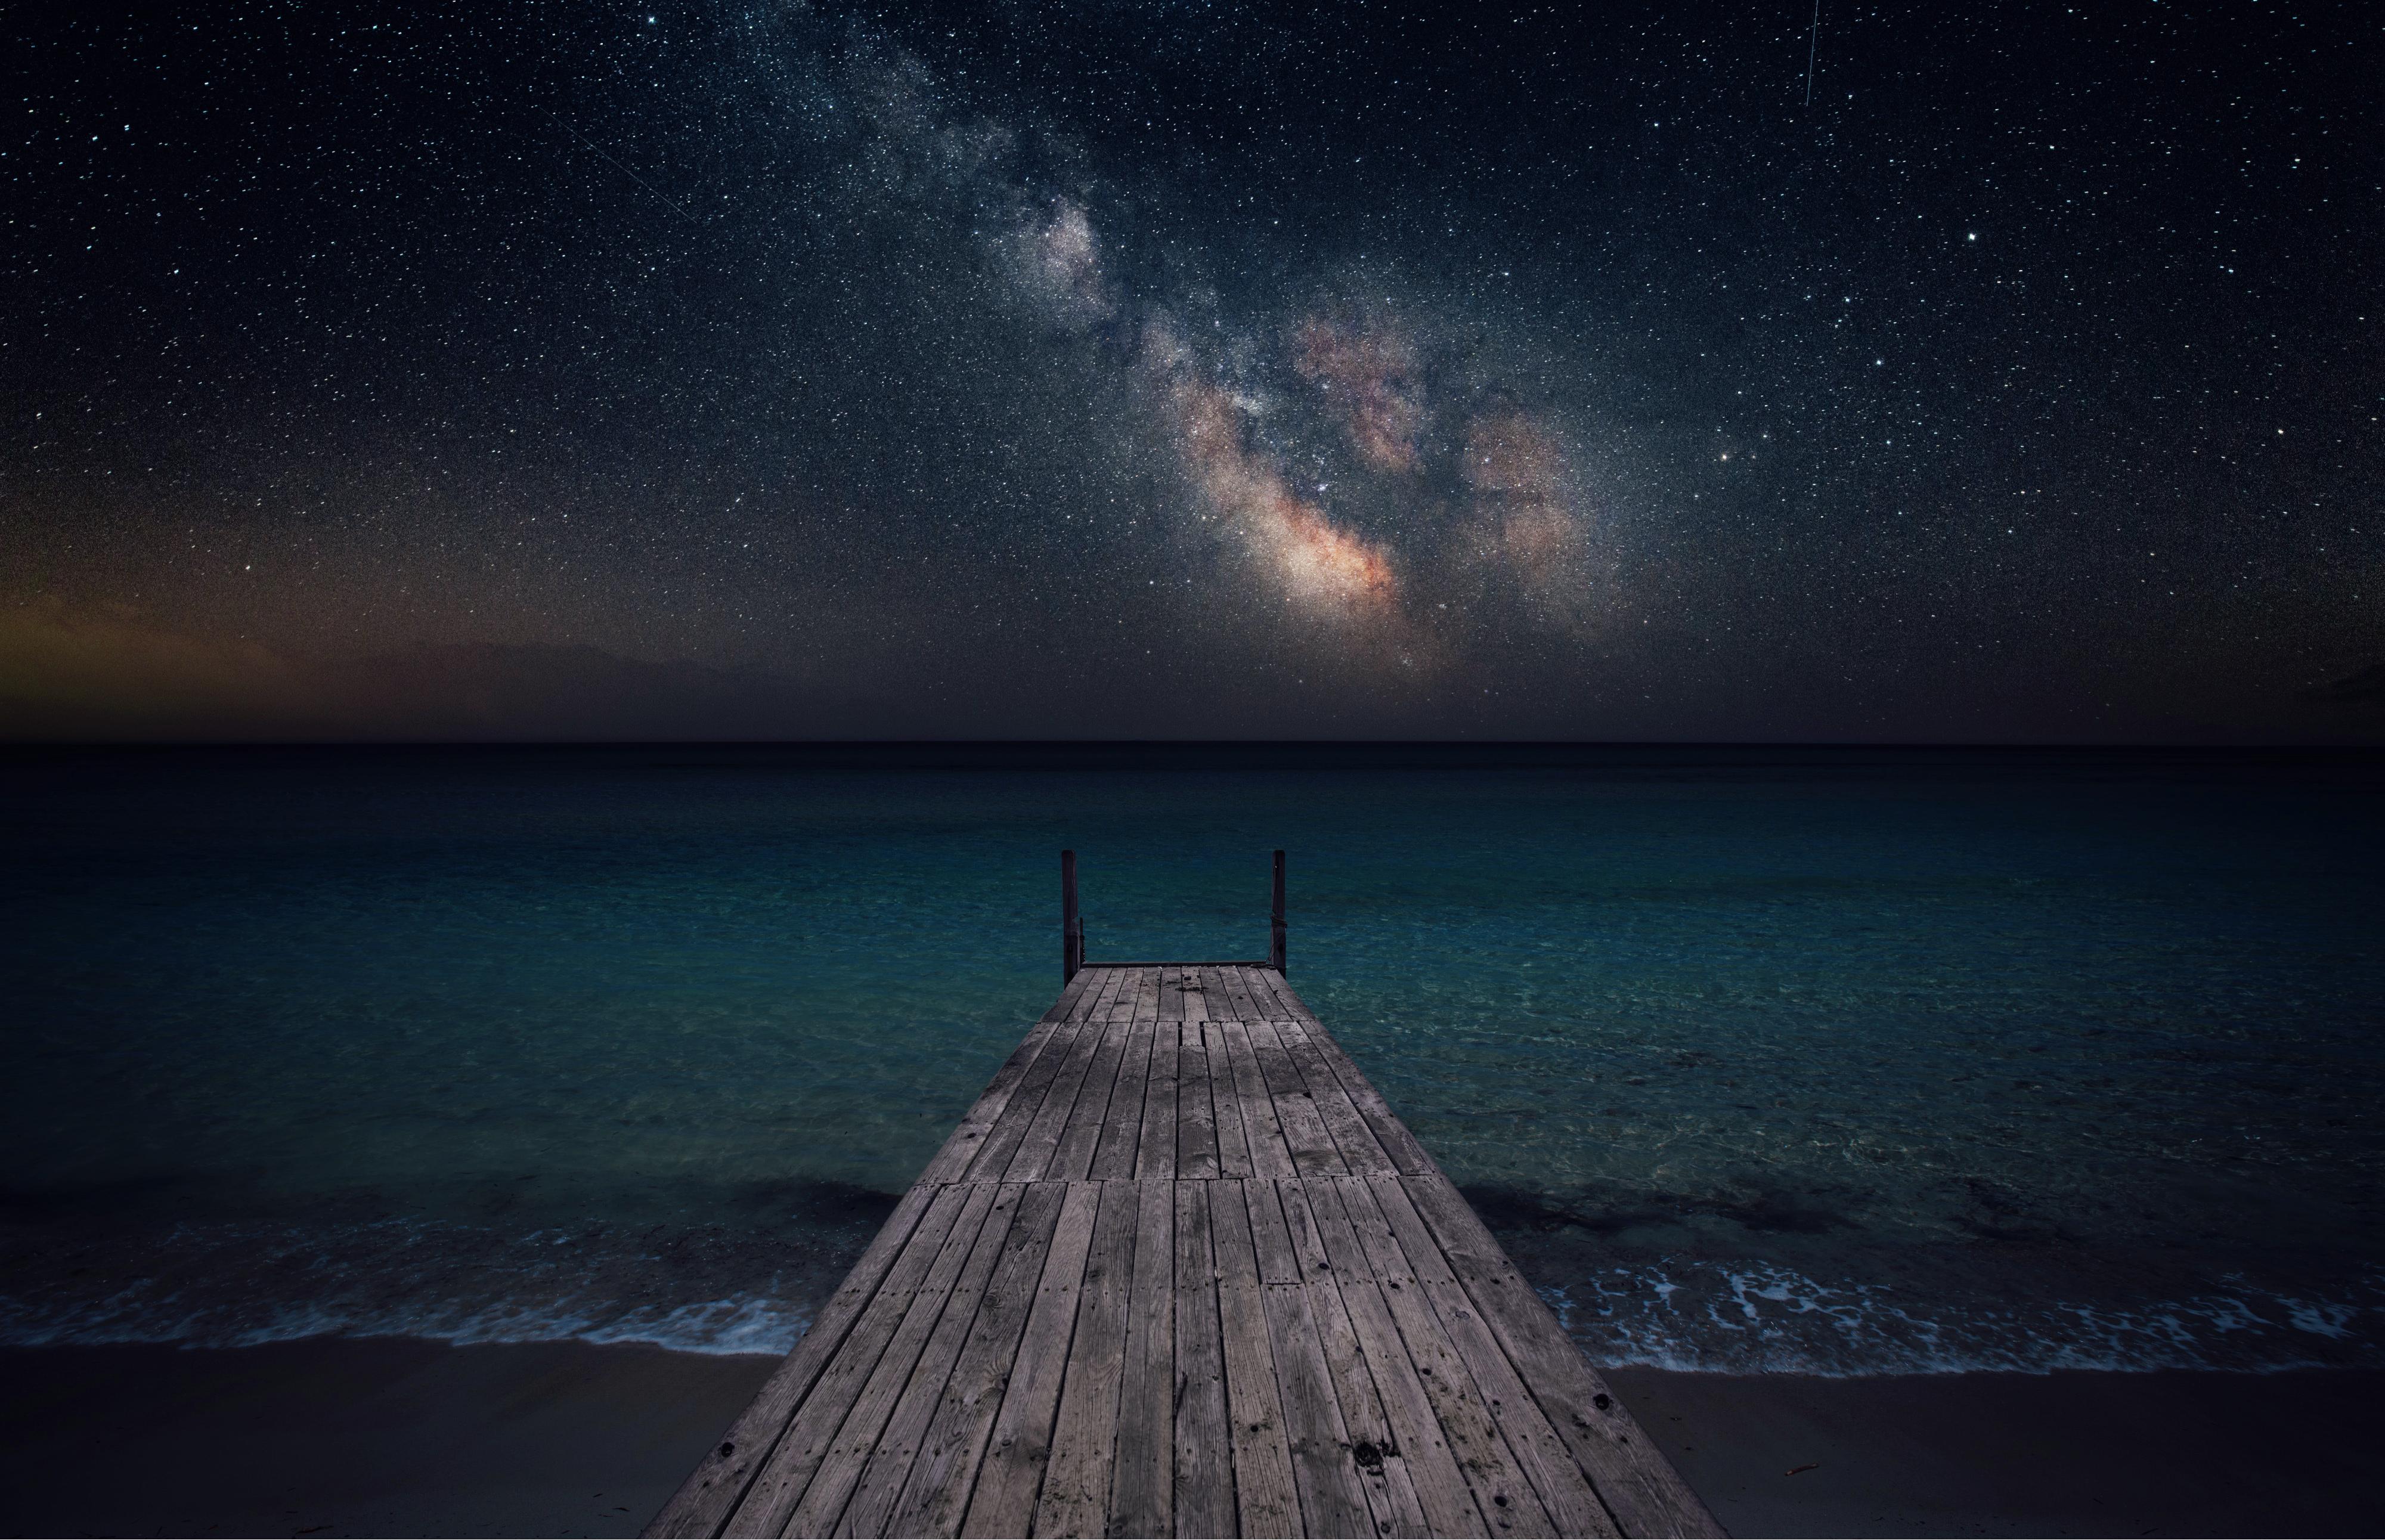 night-beach-pier-stars